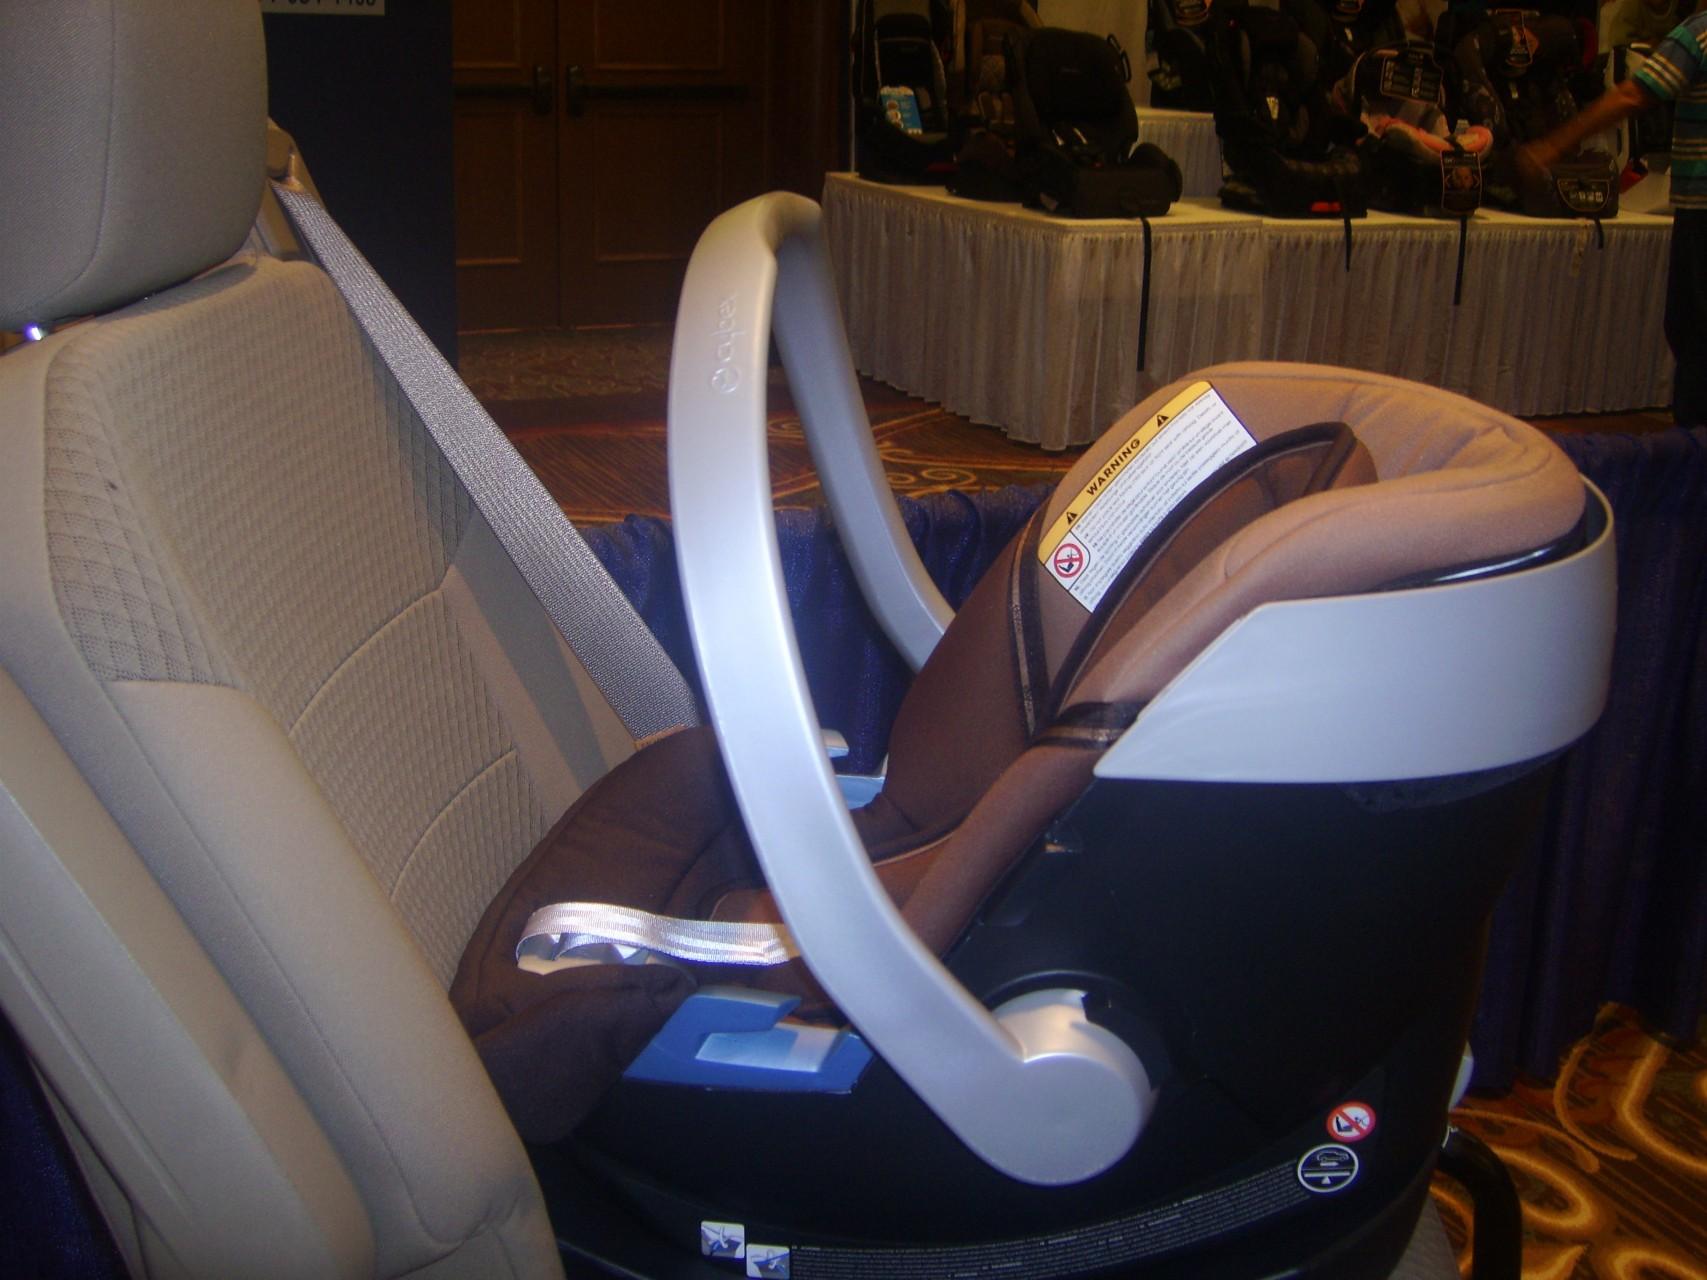 Cybex aton infant seat